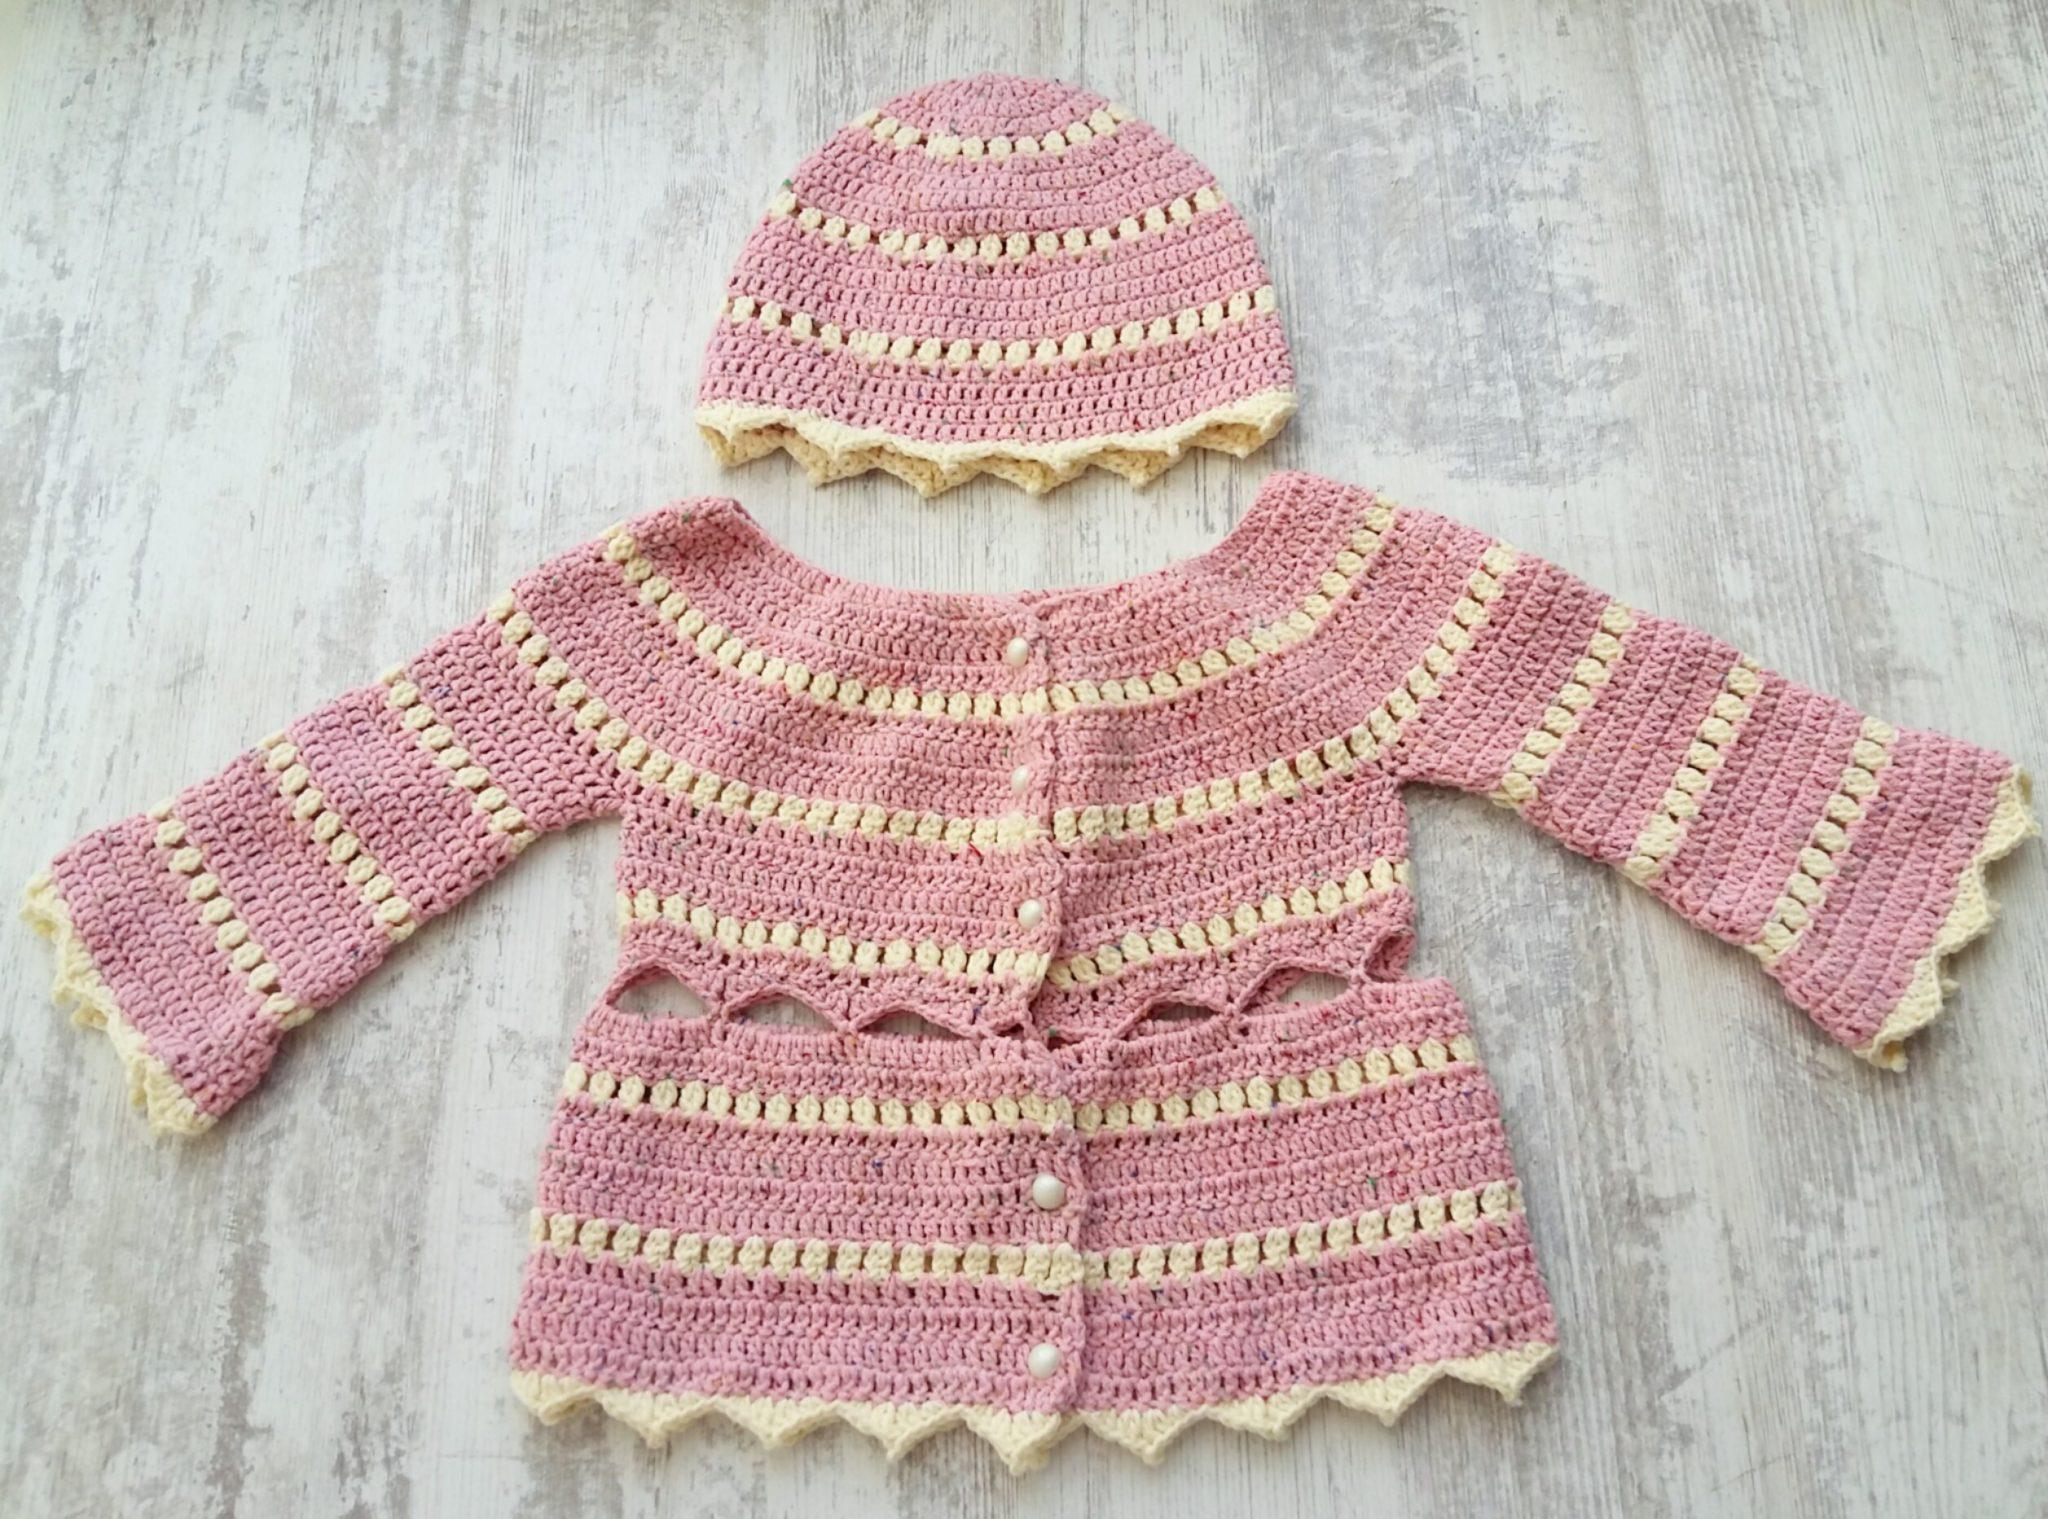 Crochet baby jacket free pattern | My Little Princess Pattern - My ...